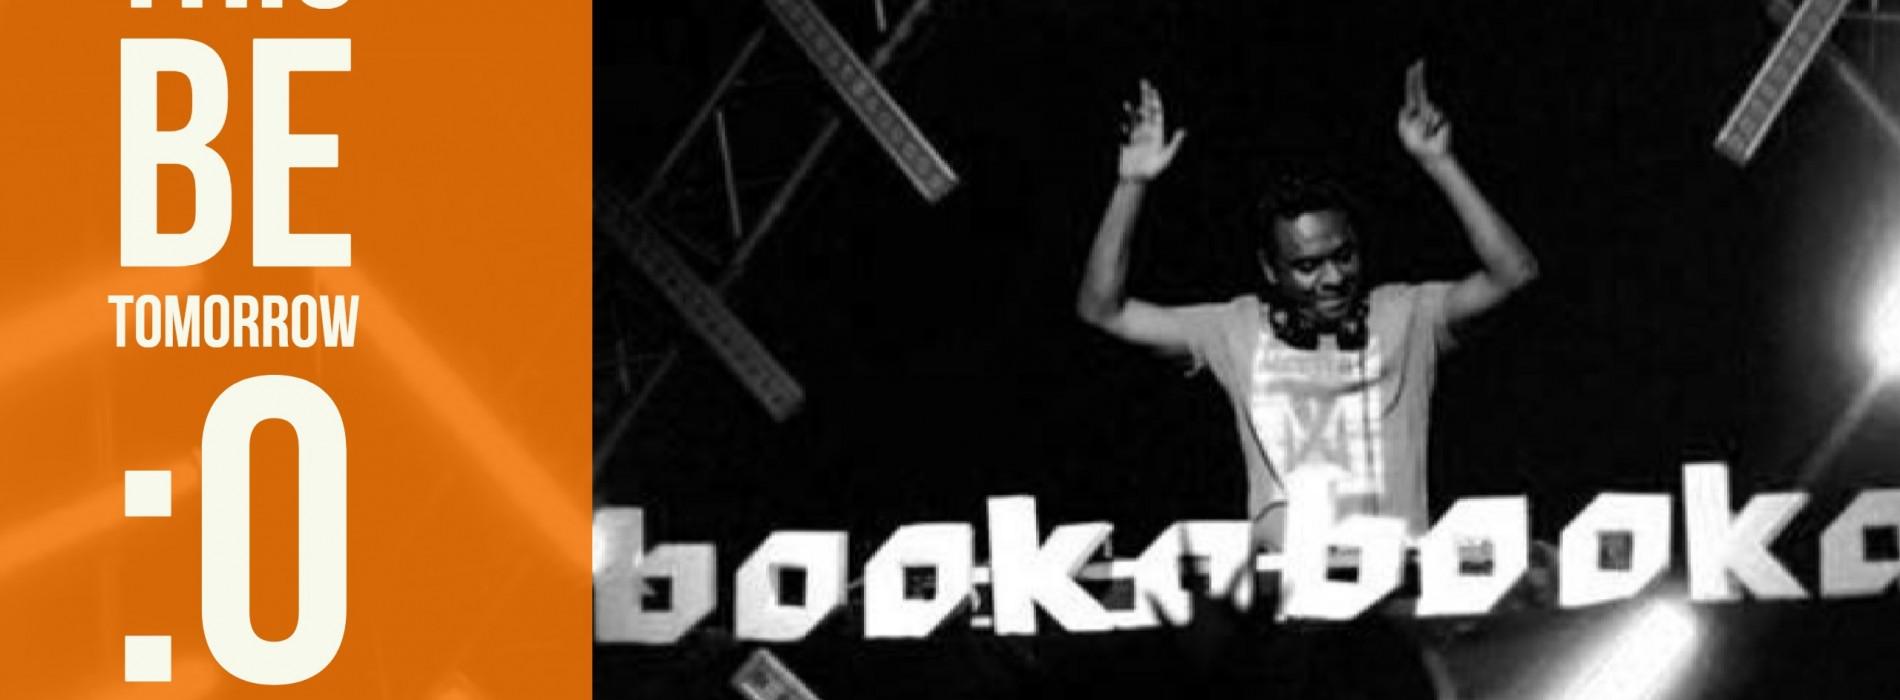 The Countdown To Booka Booka – Oh Ma Gah! Its Tomorrow!